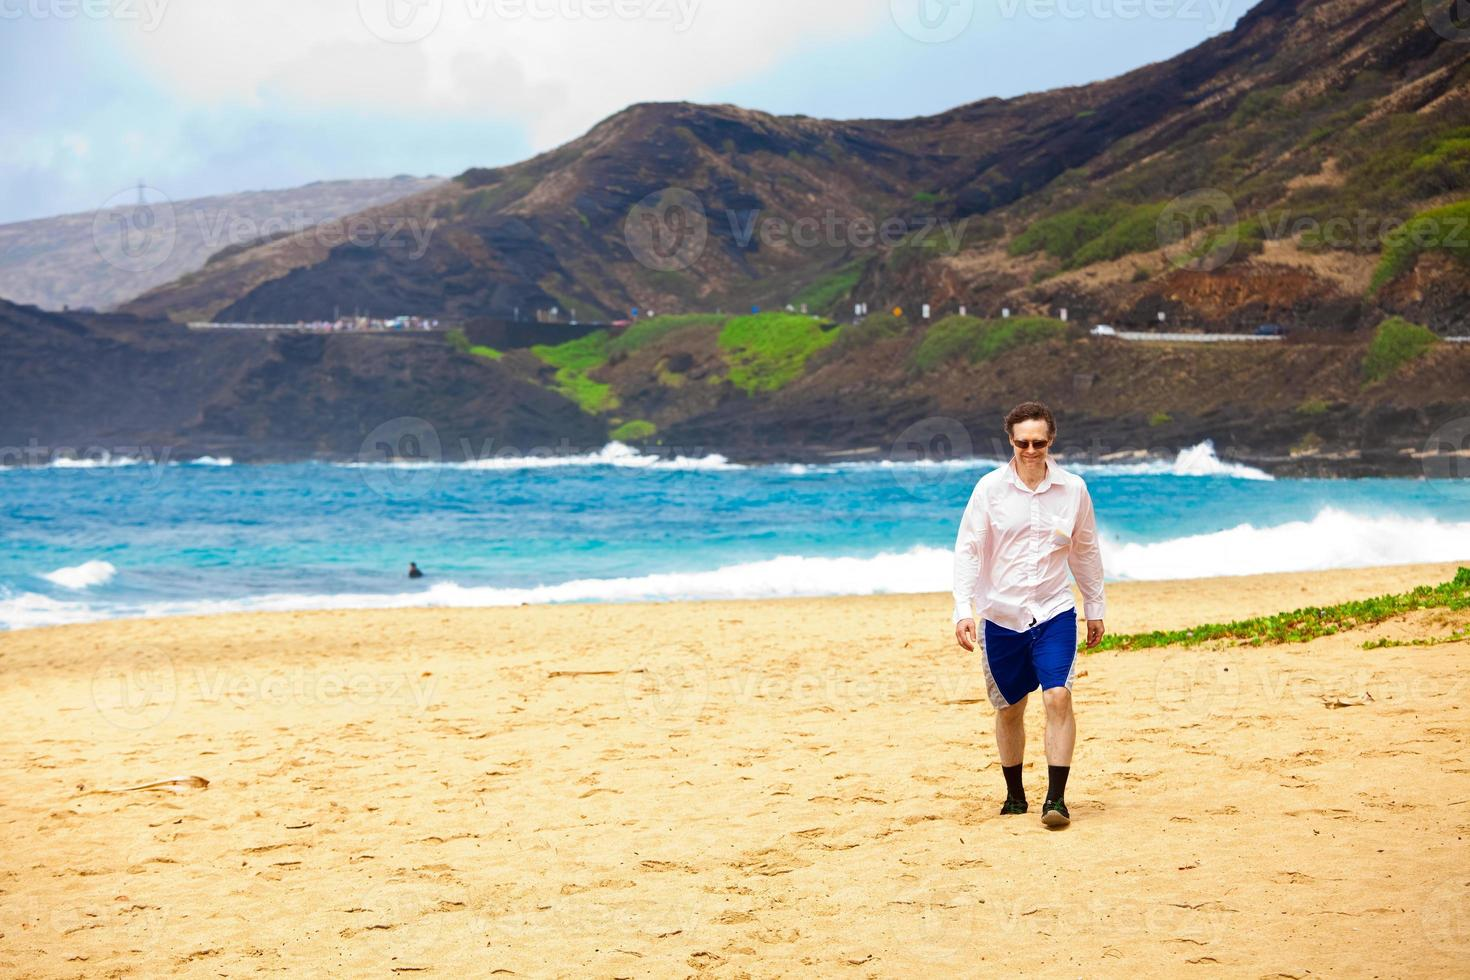 Caucasian man in mid forties on Hawaiian beach photo